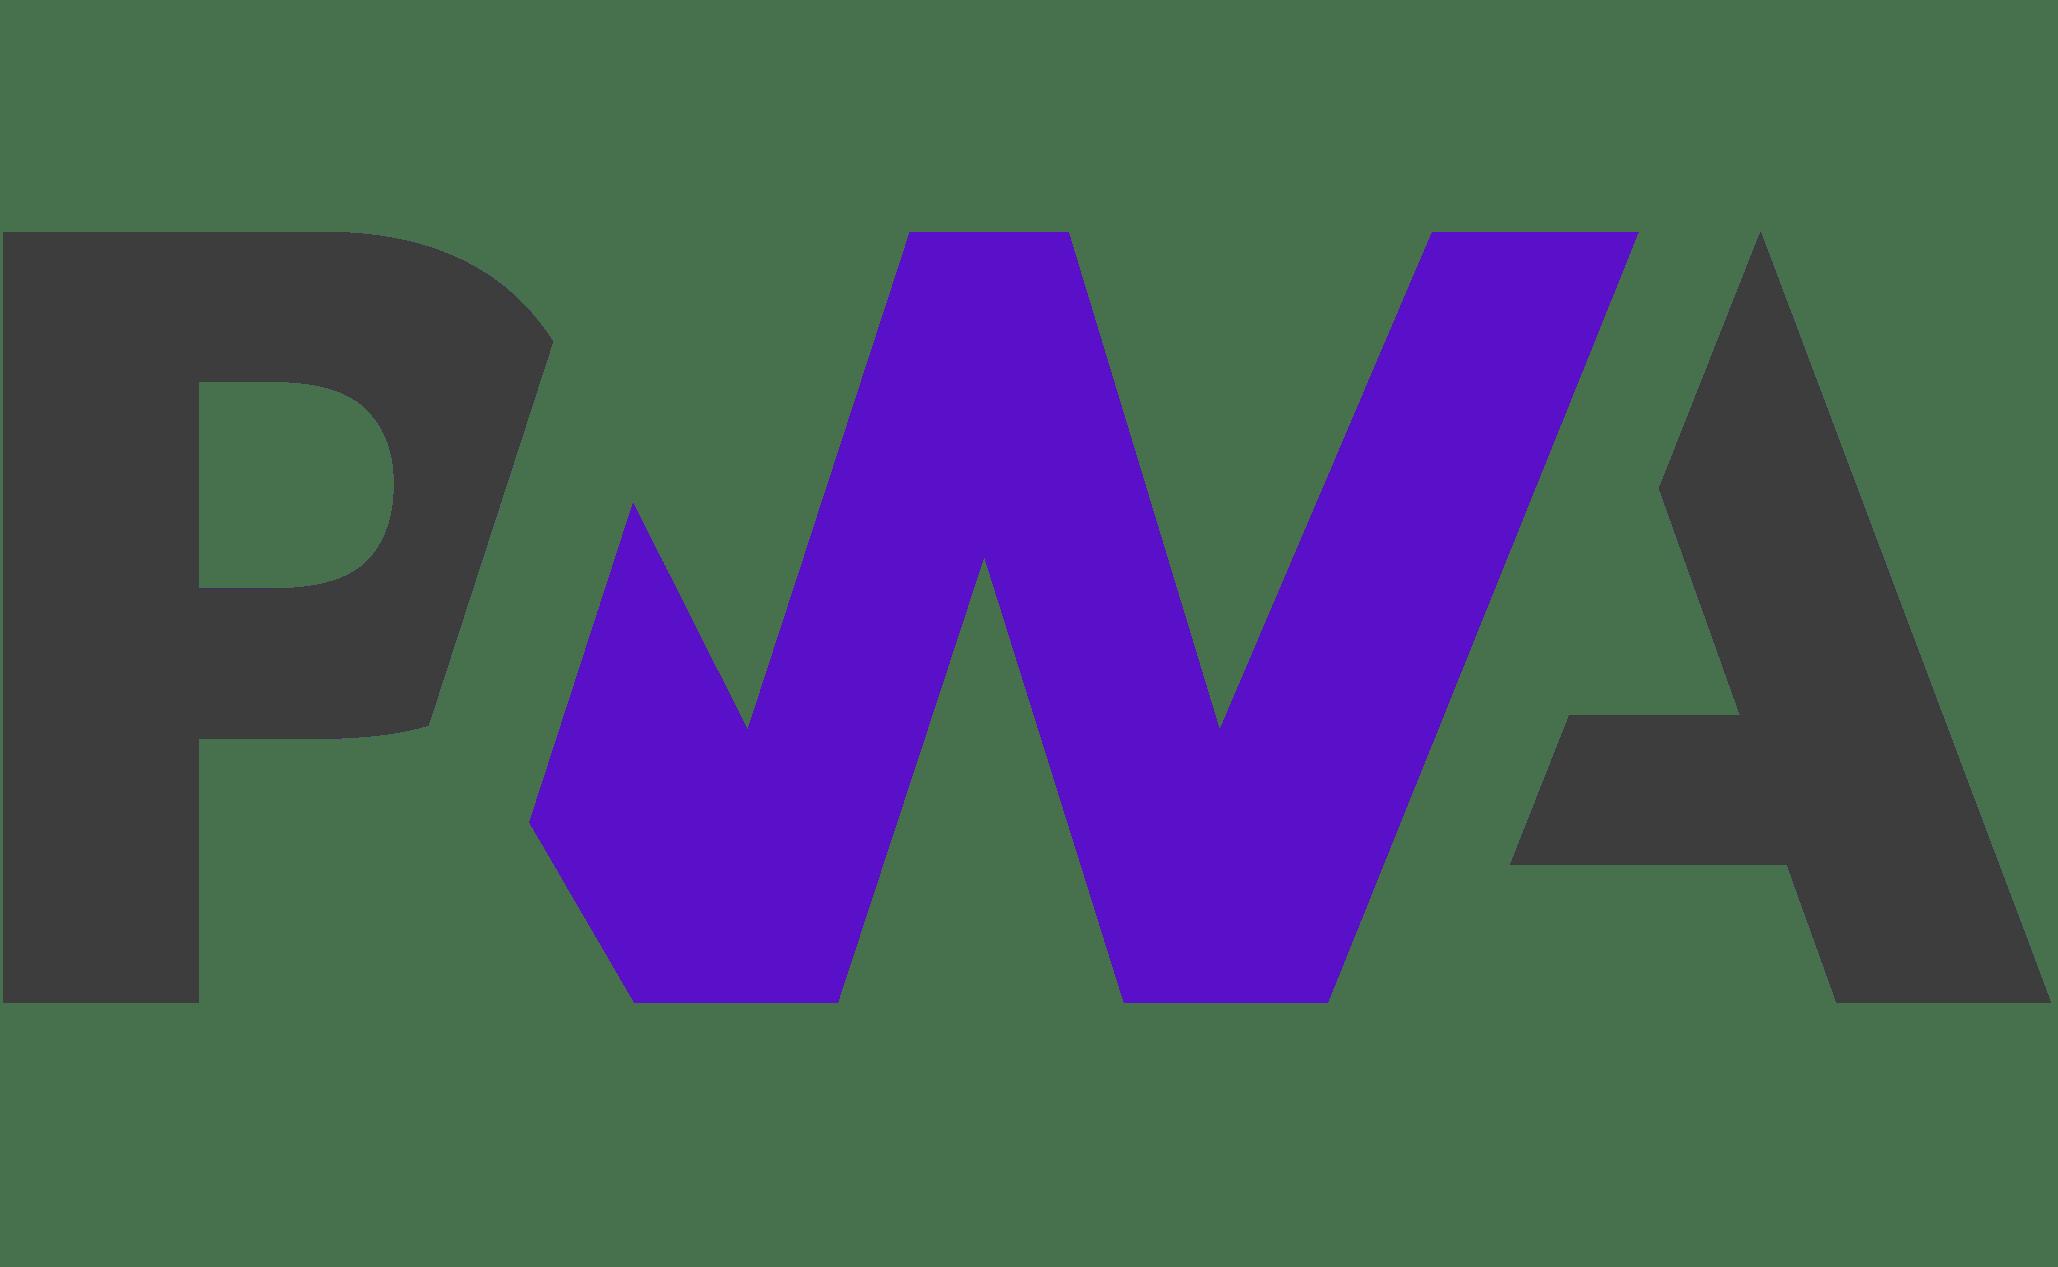 """Should I Consider PWA?"" Remarkable Possibilities of Progressive Web Apps"